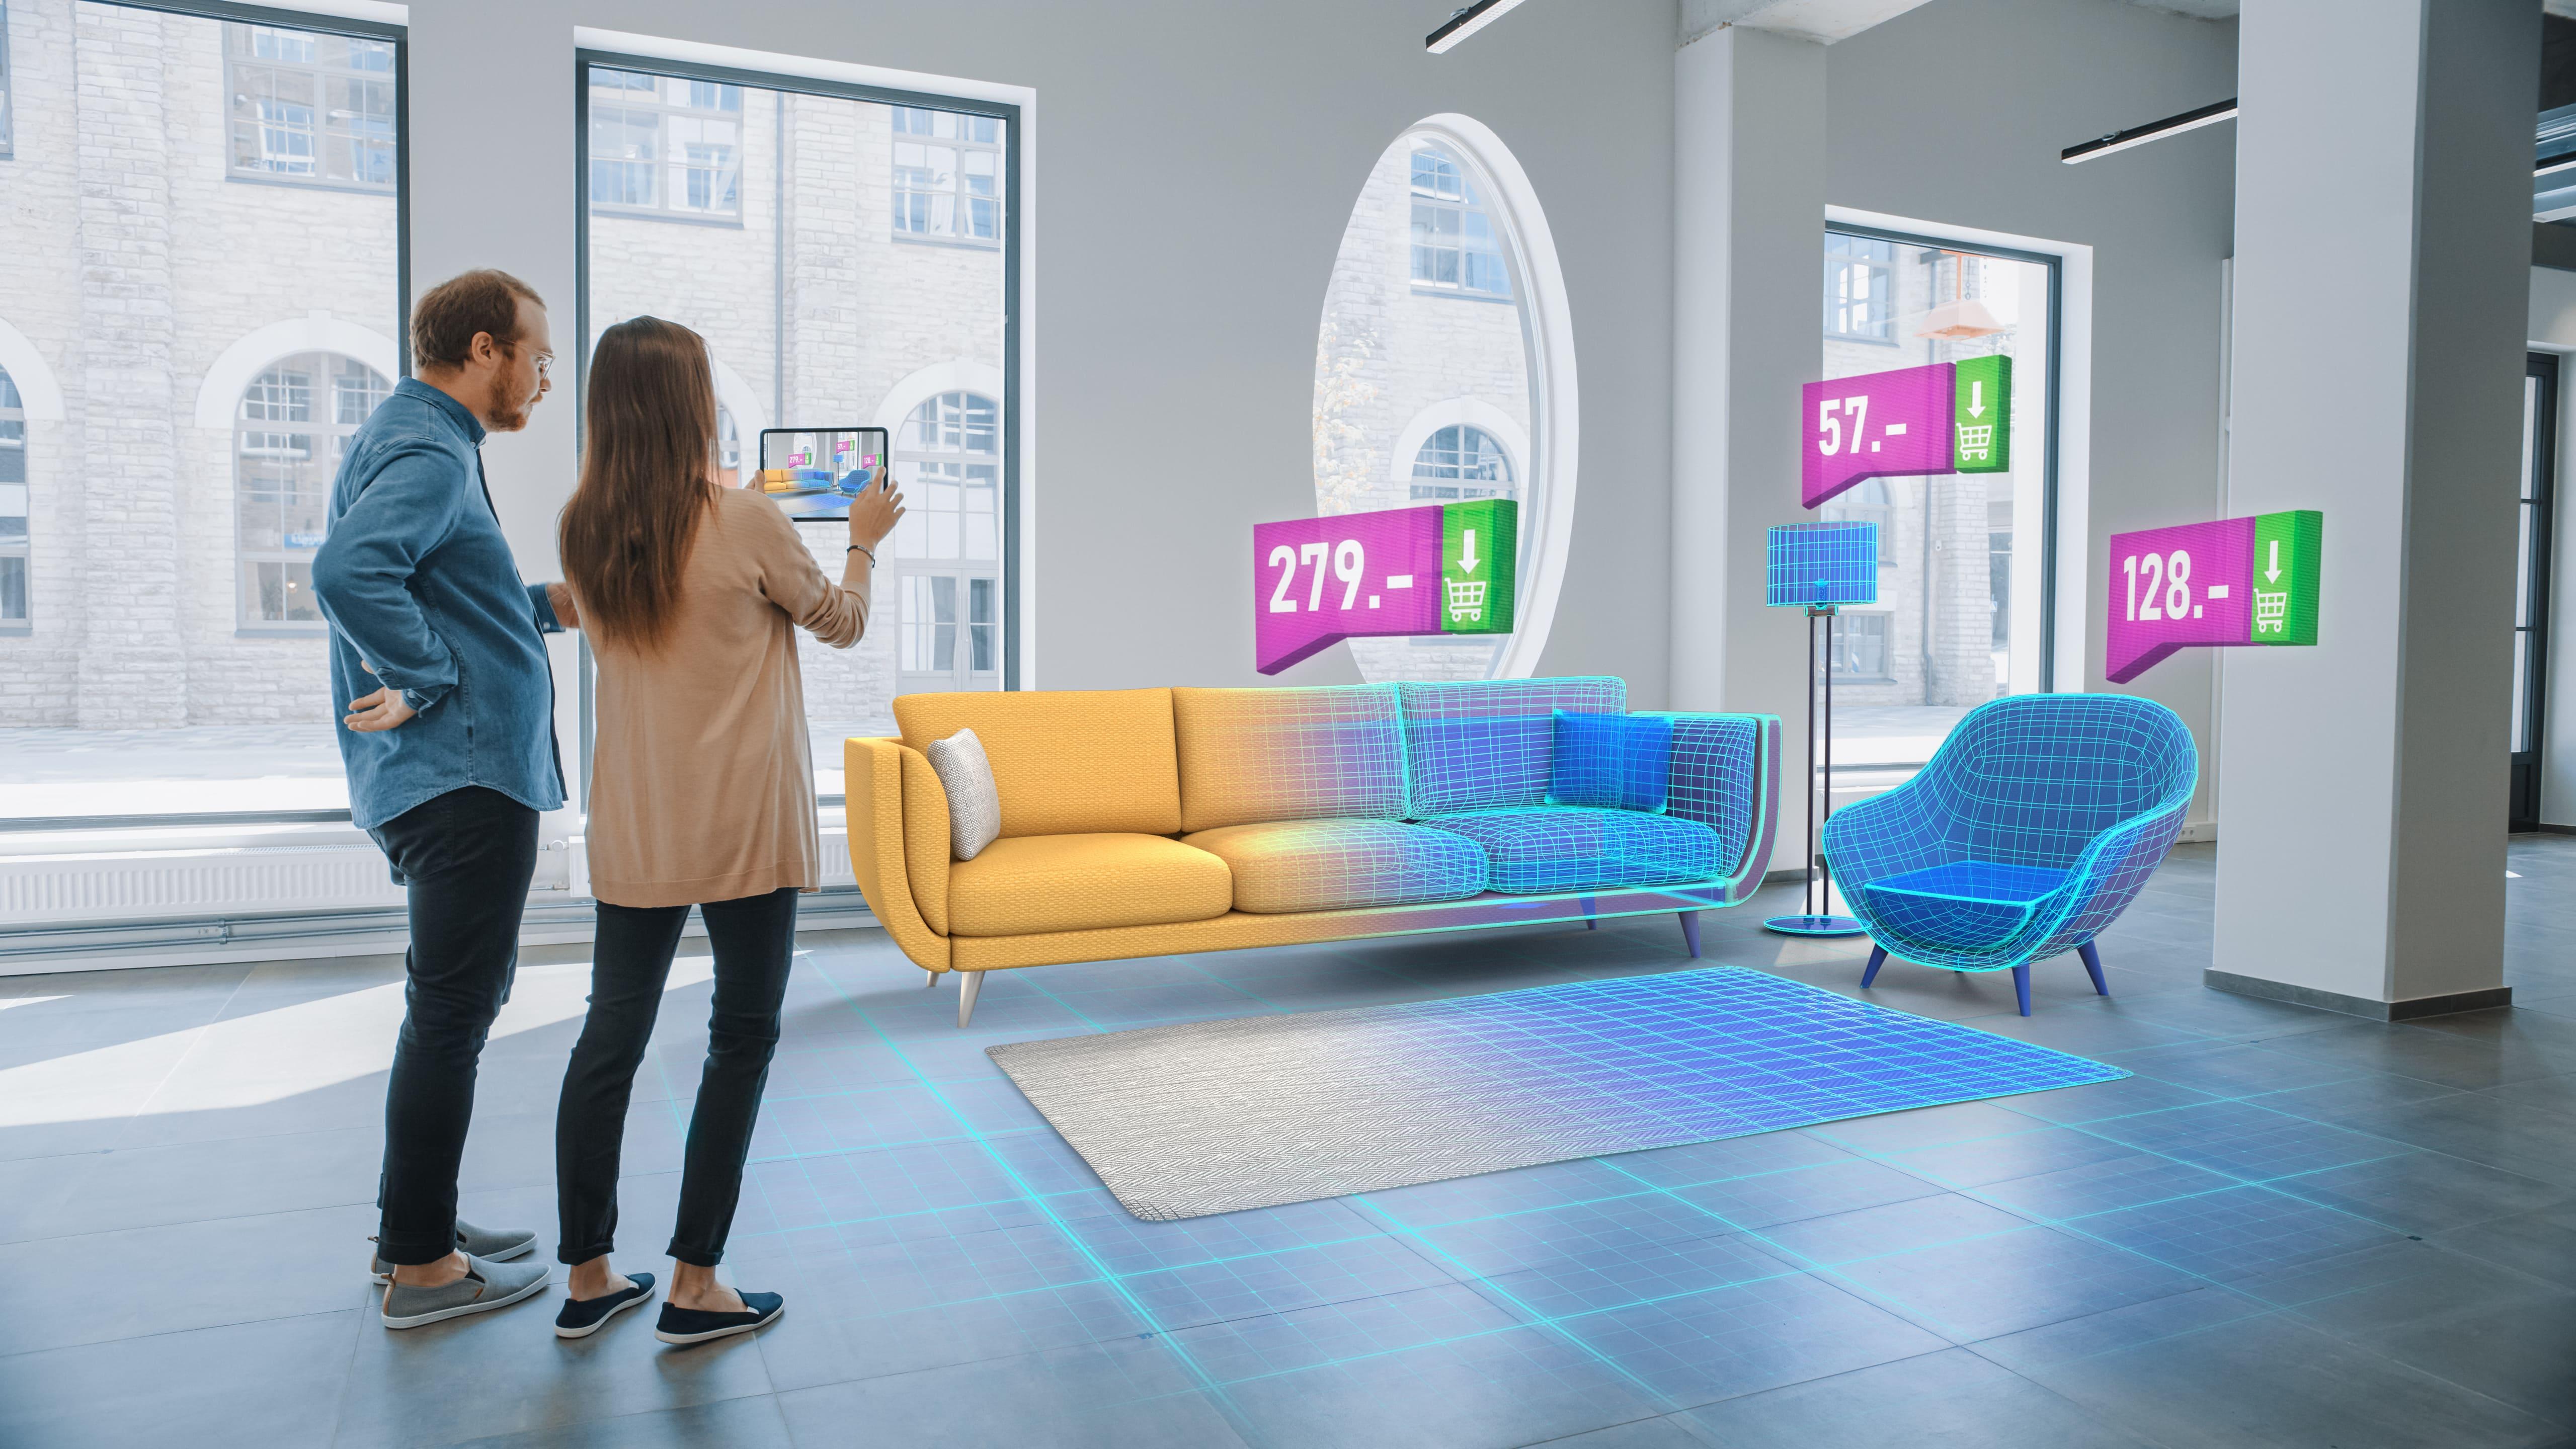 virtual reality application for retail: virtual reality store